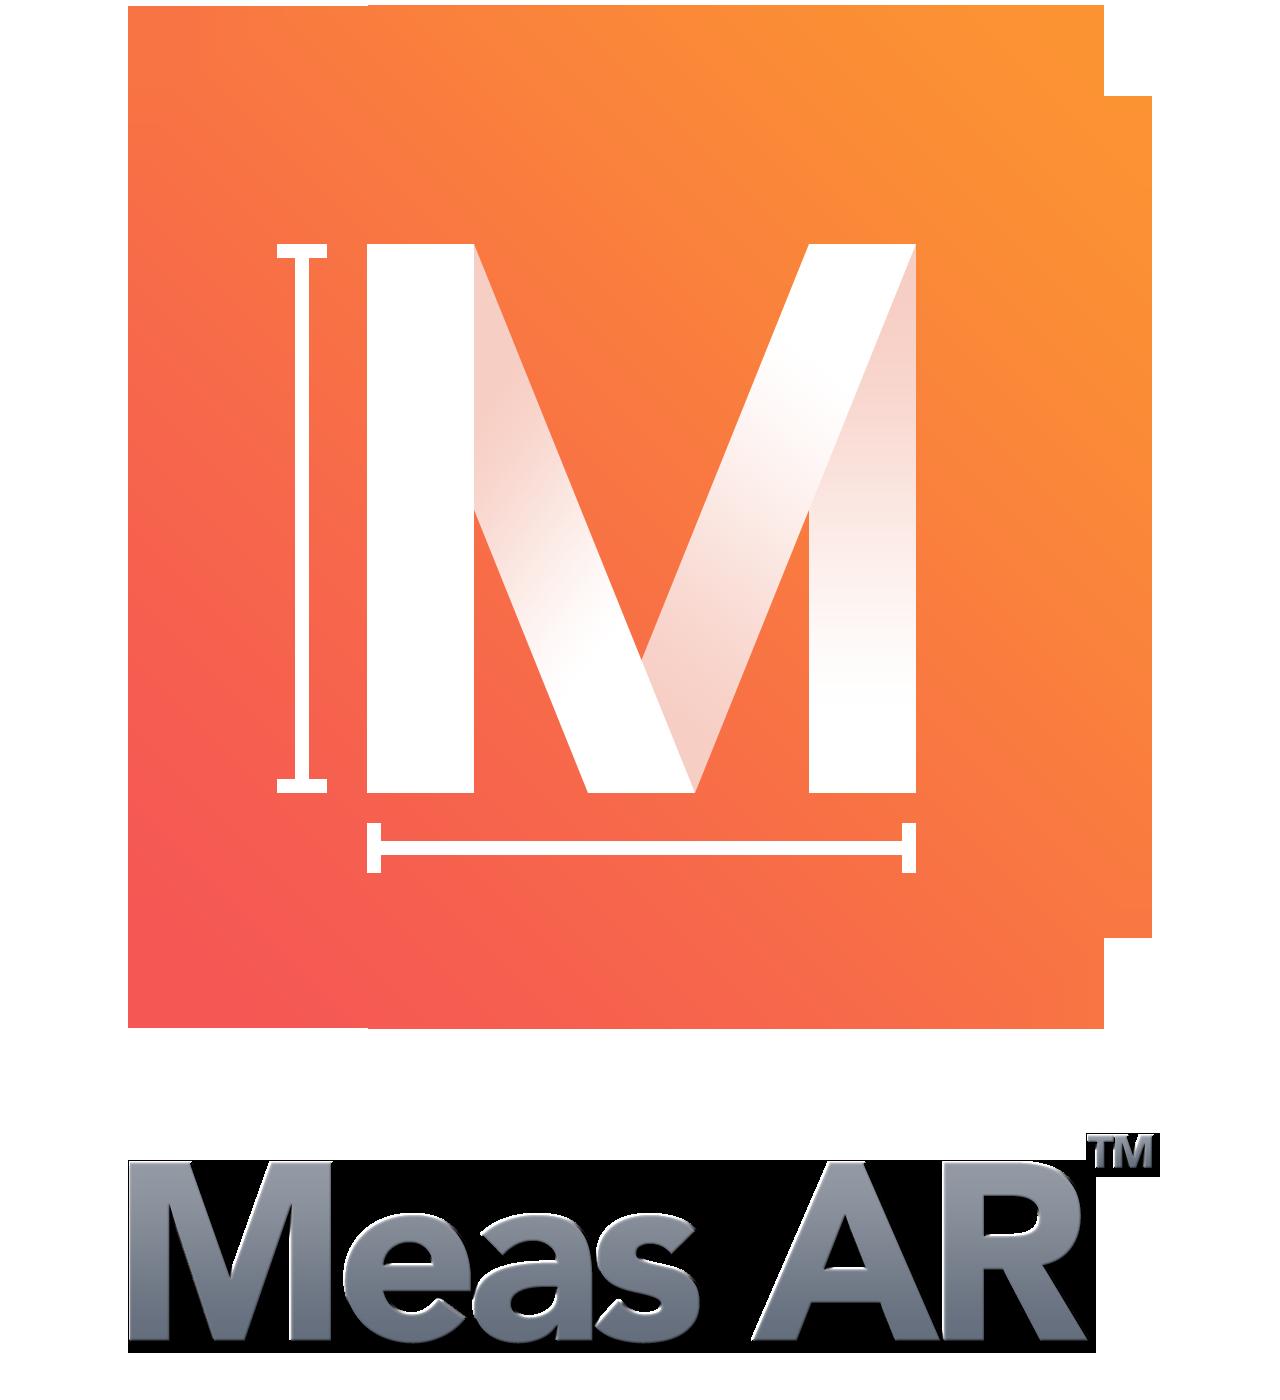 Meas AR A simple fun measuring app for iOS 11 Fun facts